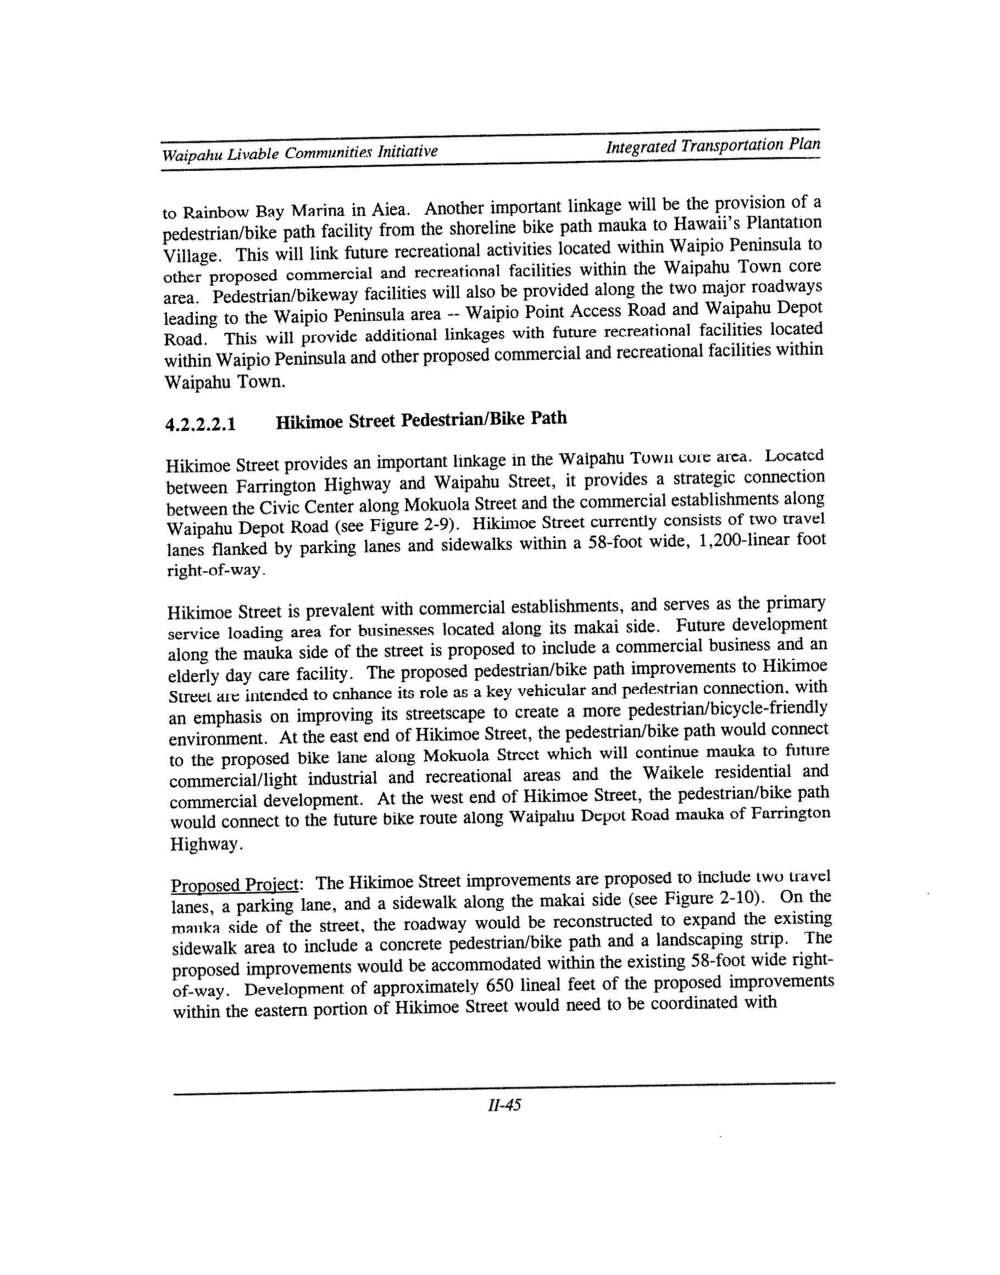 160531_WaipahuLivableCommunities(1998)_Page_060.jpg